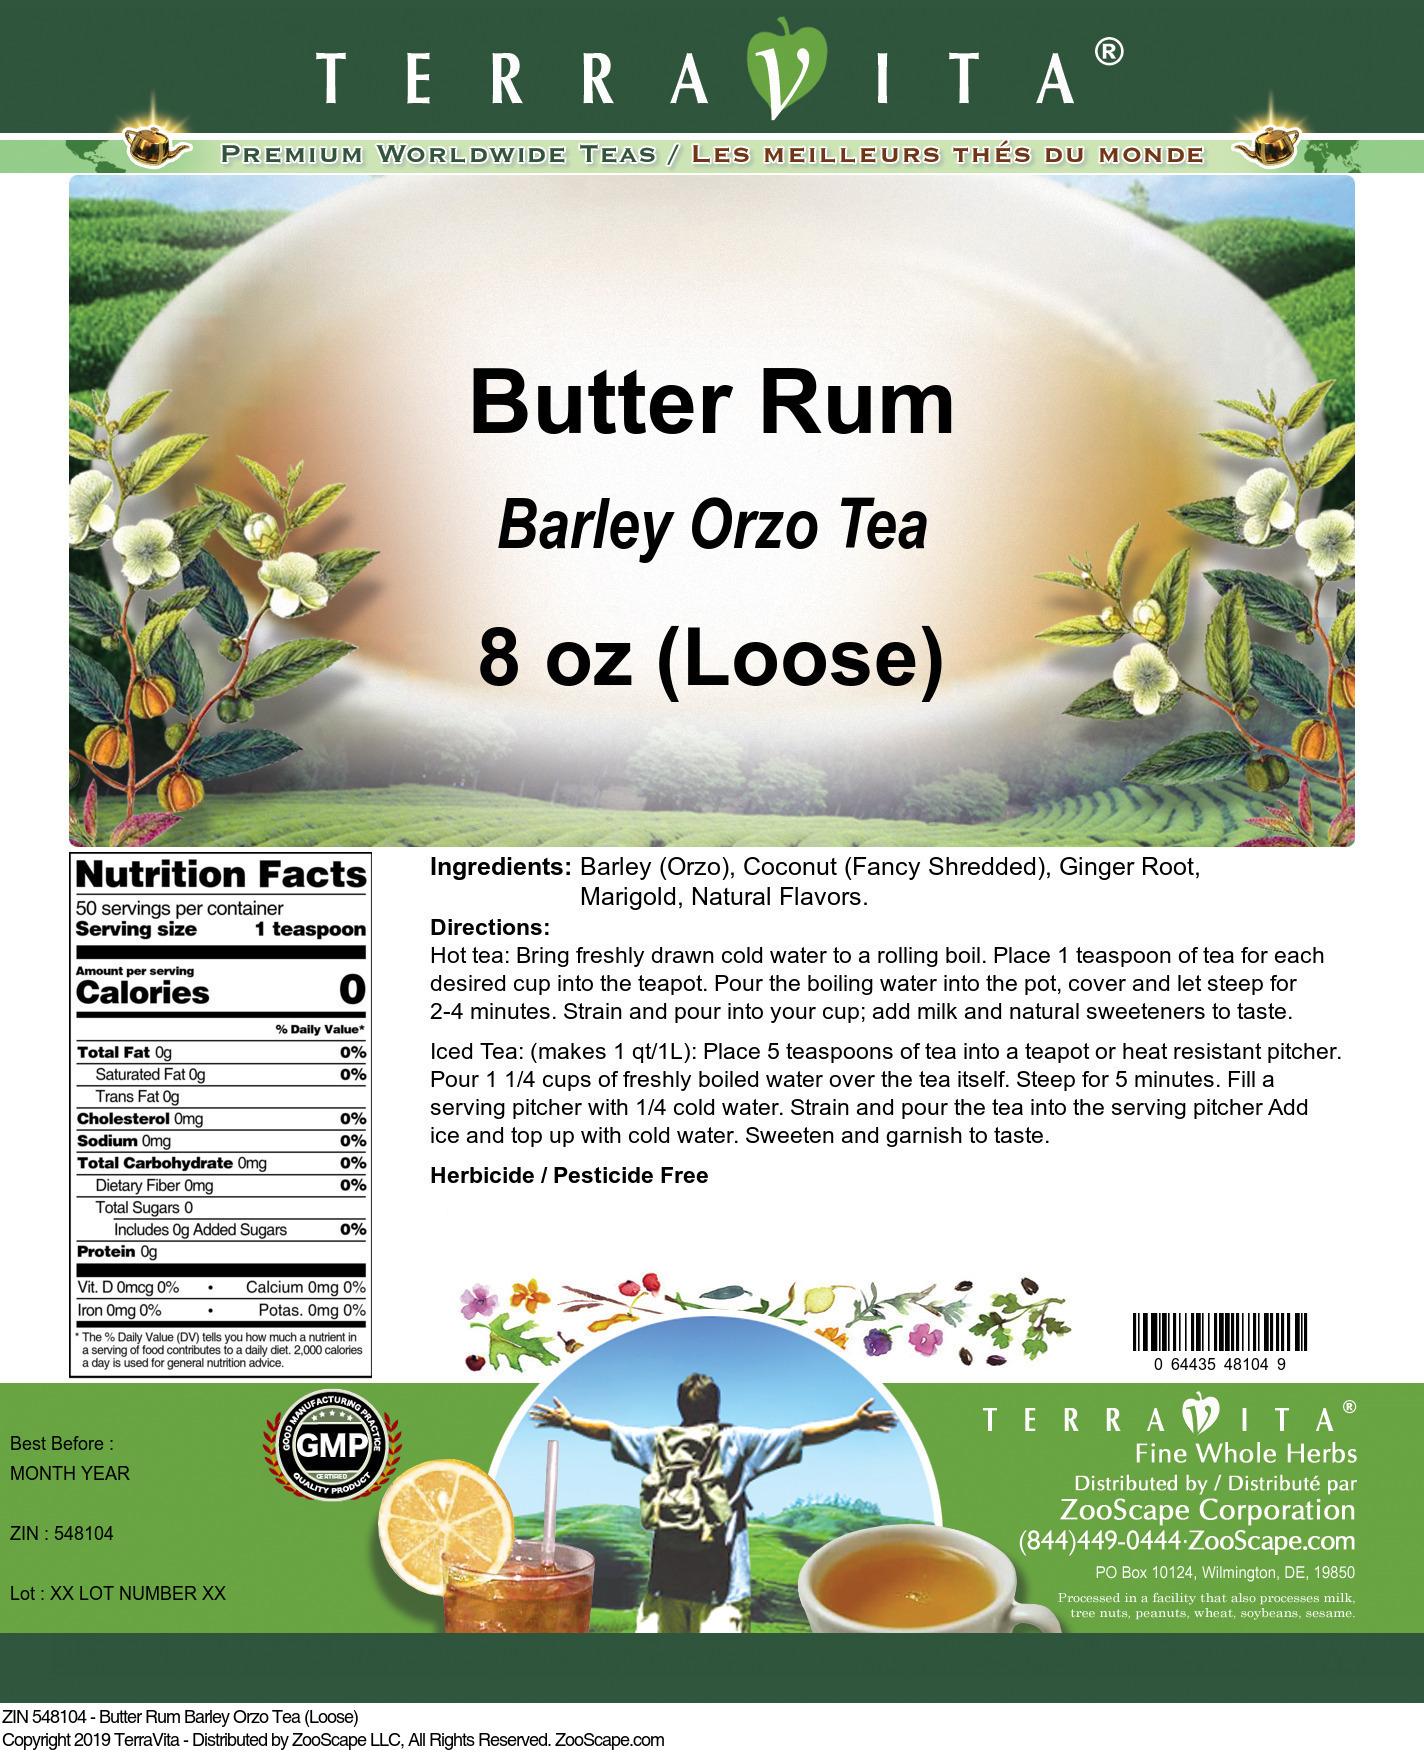 Butter Rum Barley Orzo Tea (Loose)